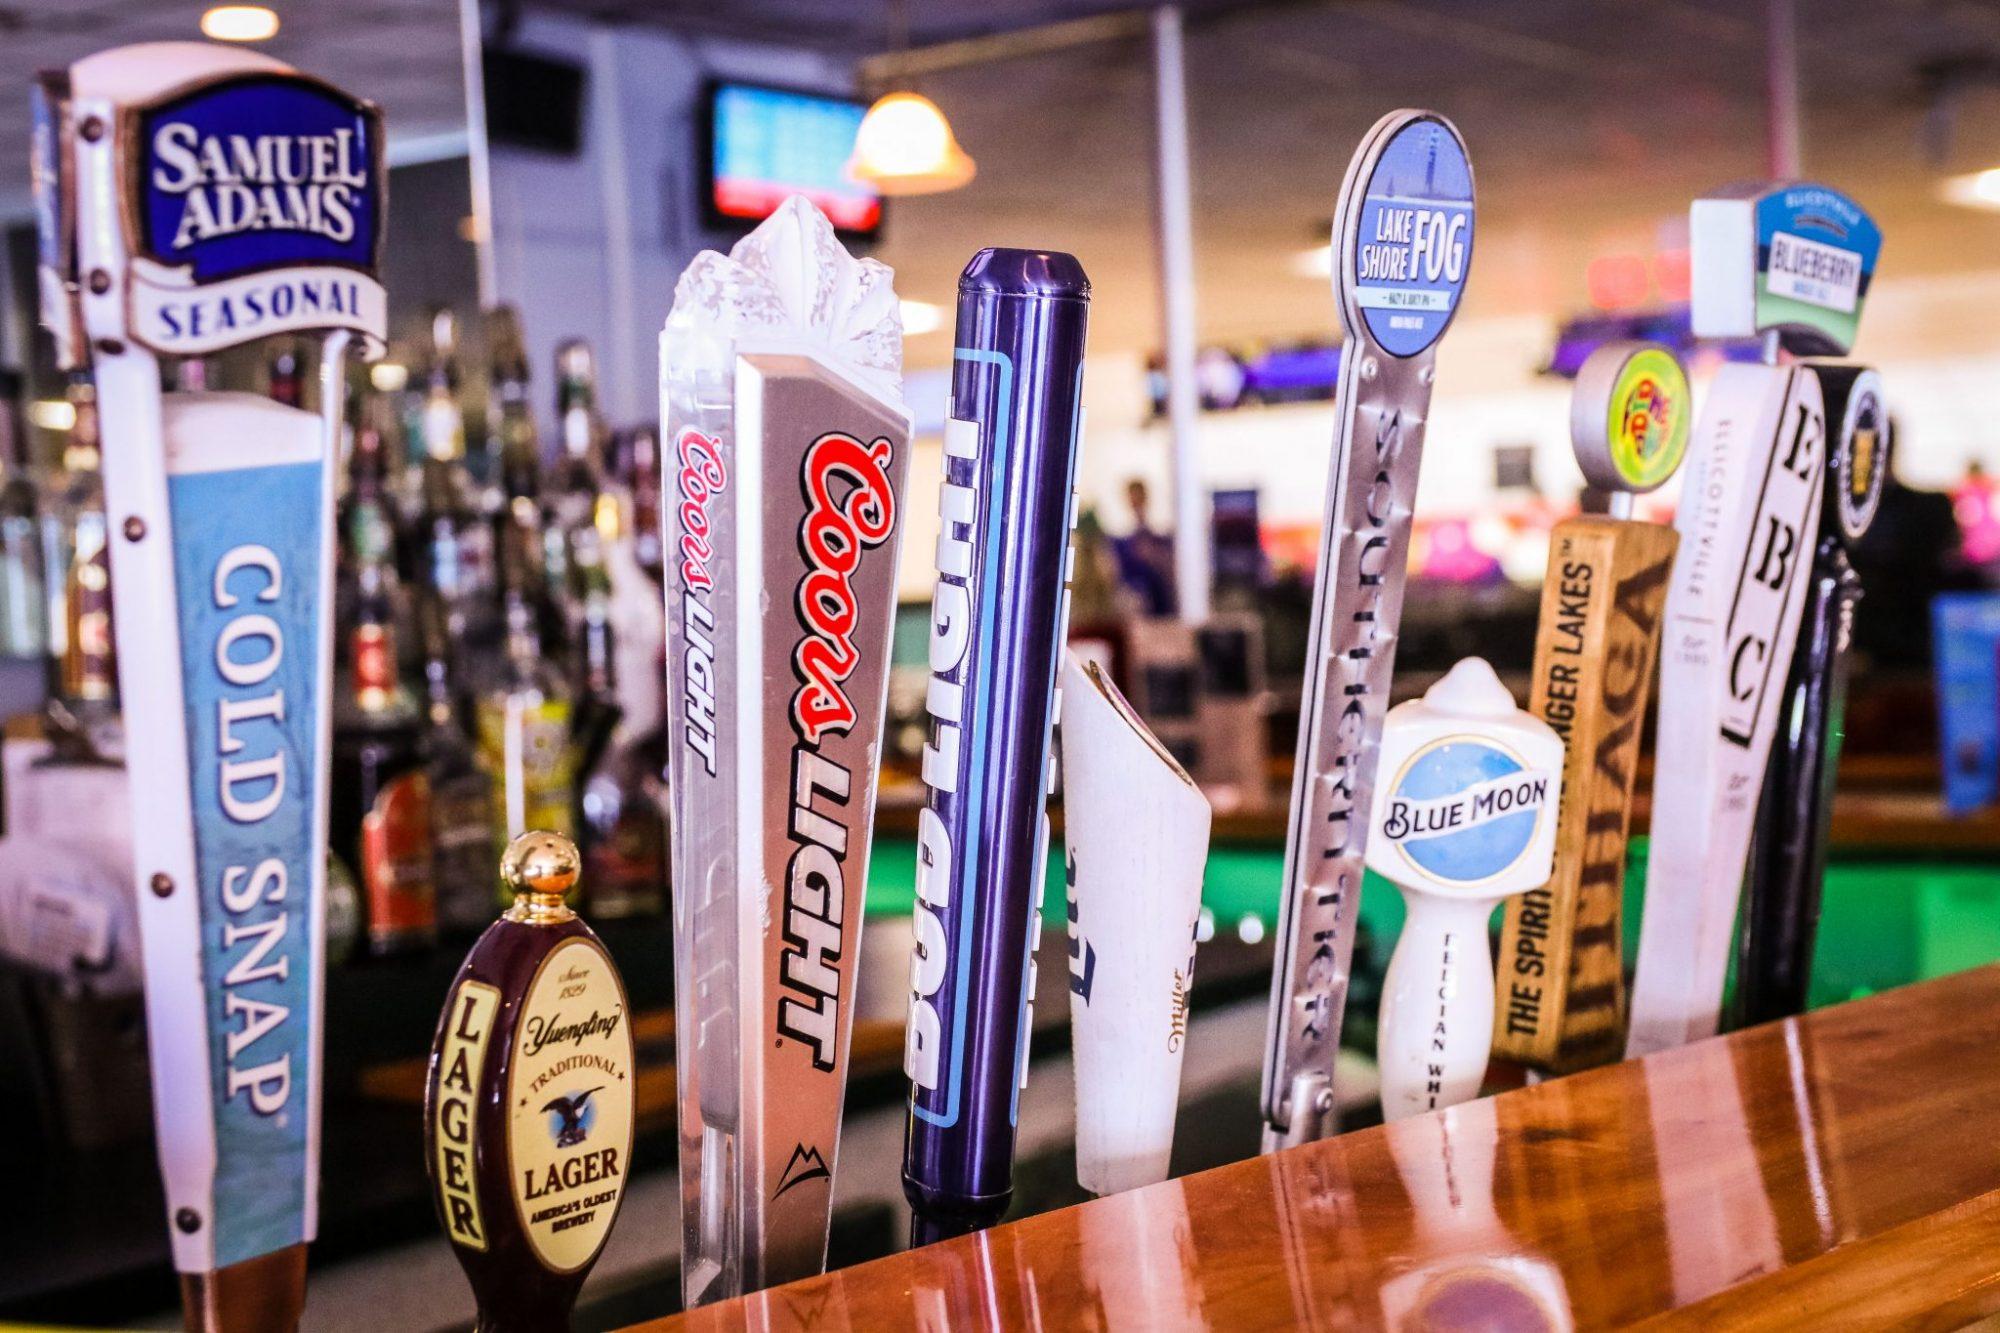 Enjoy Our Full-Service Bar & Restaurant